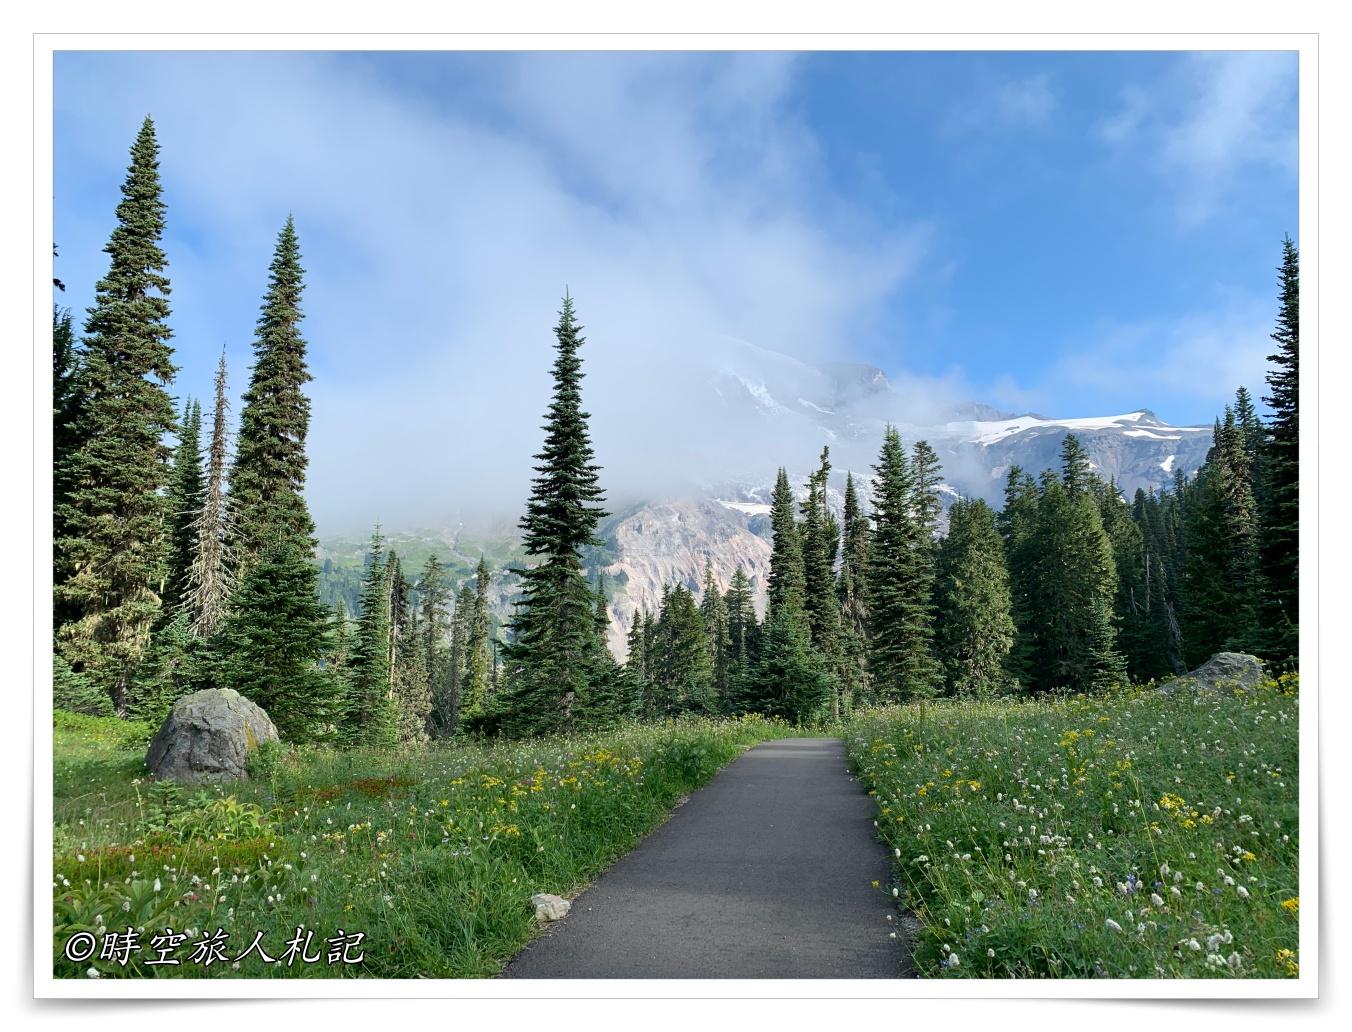 雷尼爾山國家公園Mt Rainier National Park 3日遊: Paradise Area – Mt Rainier Paradise Inn住宿心得、Nisqually Vista